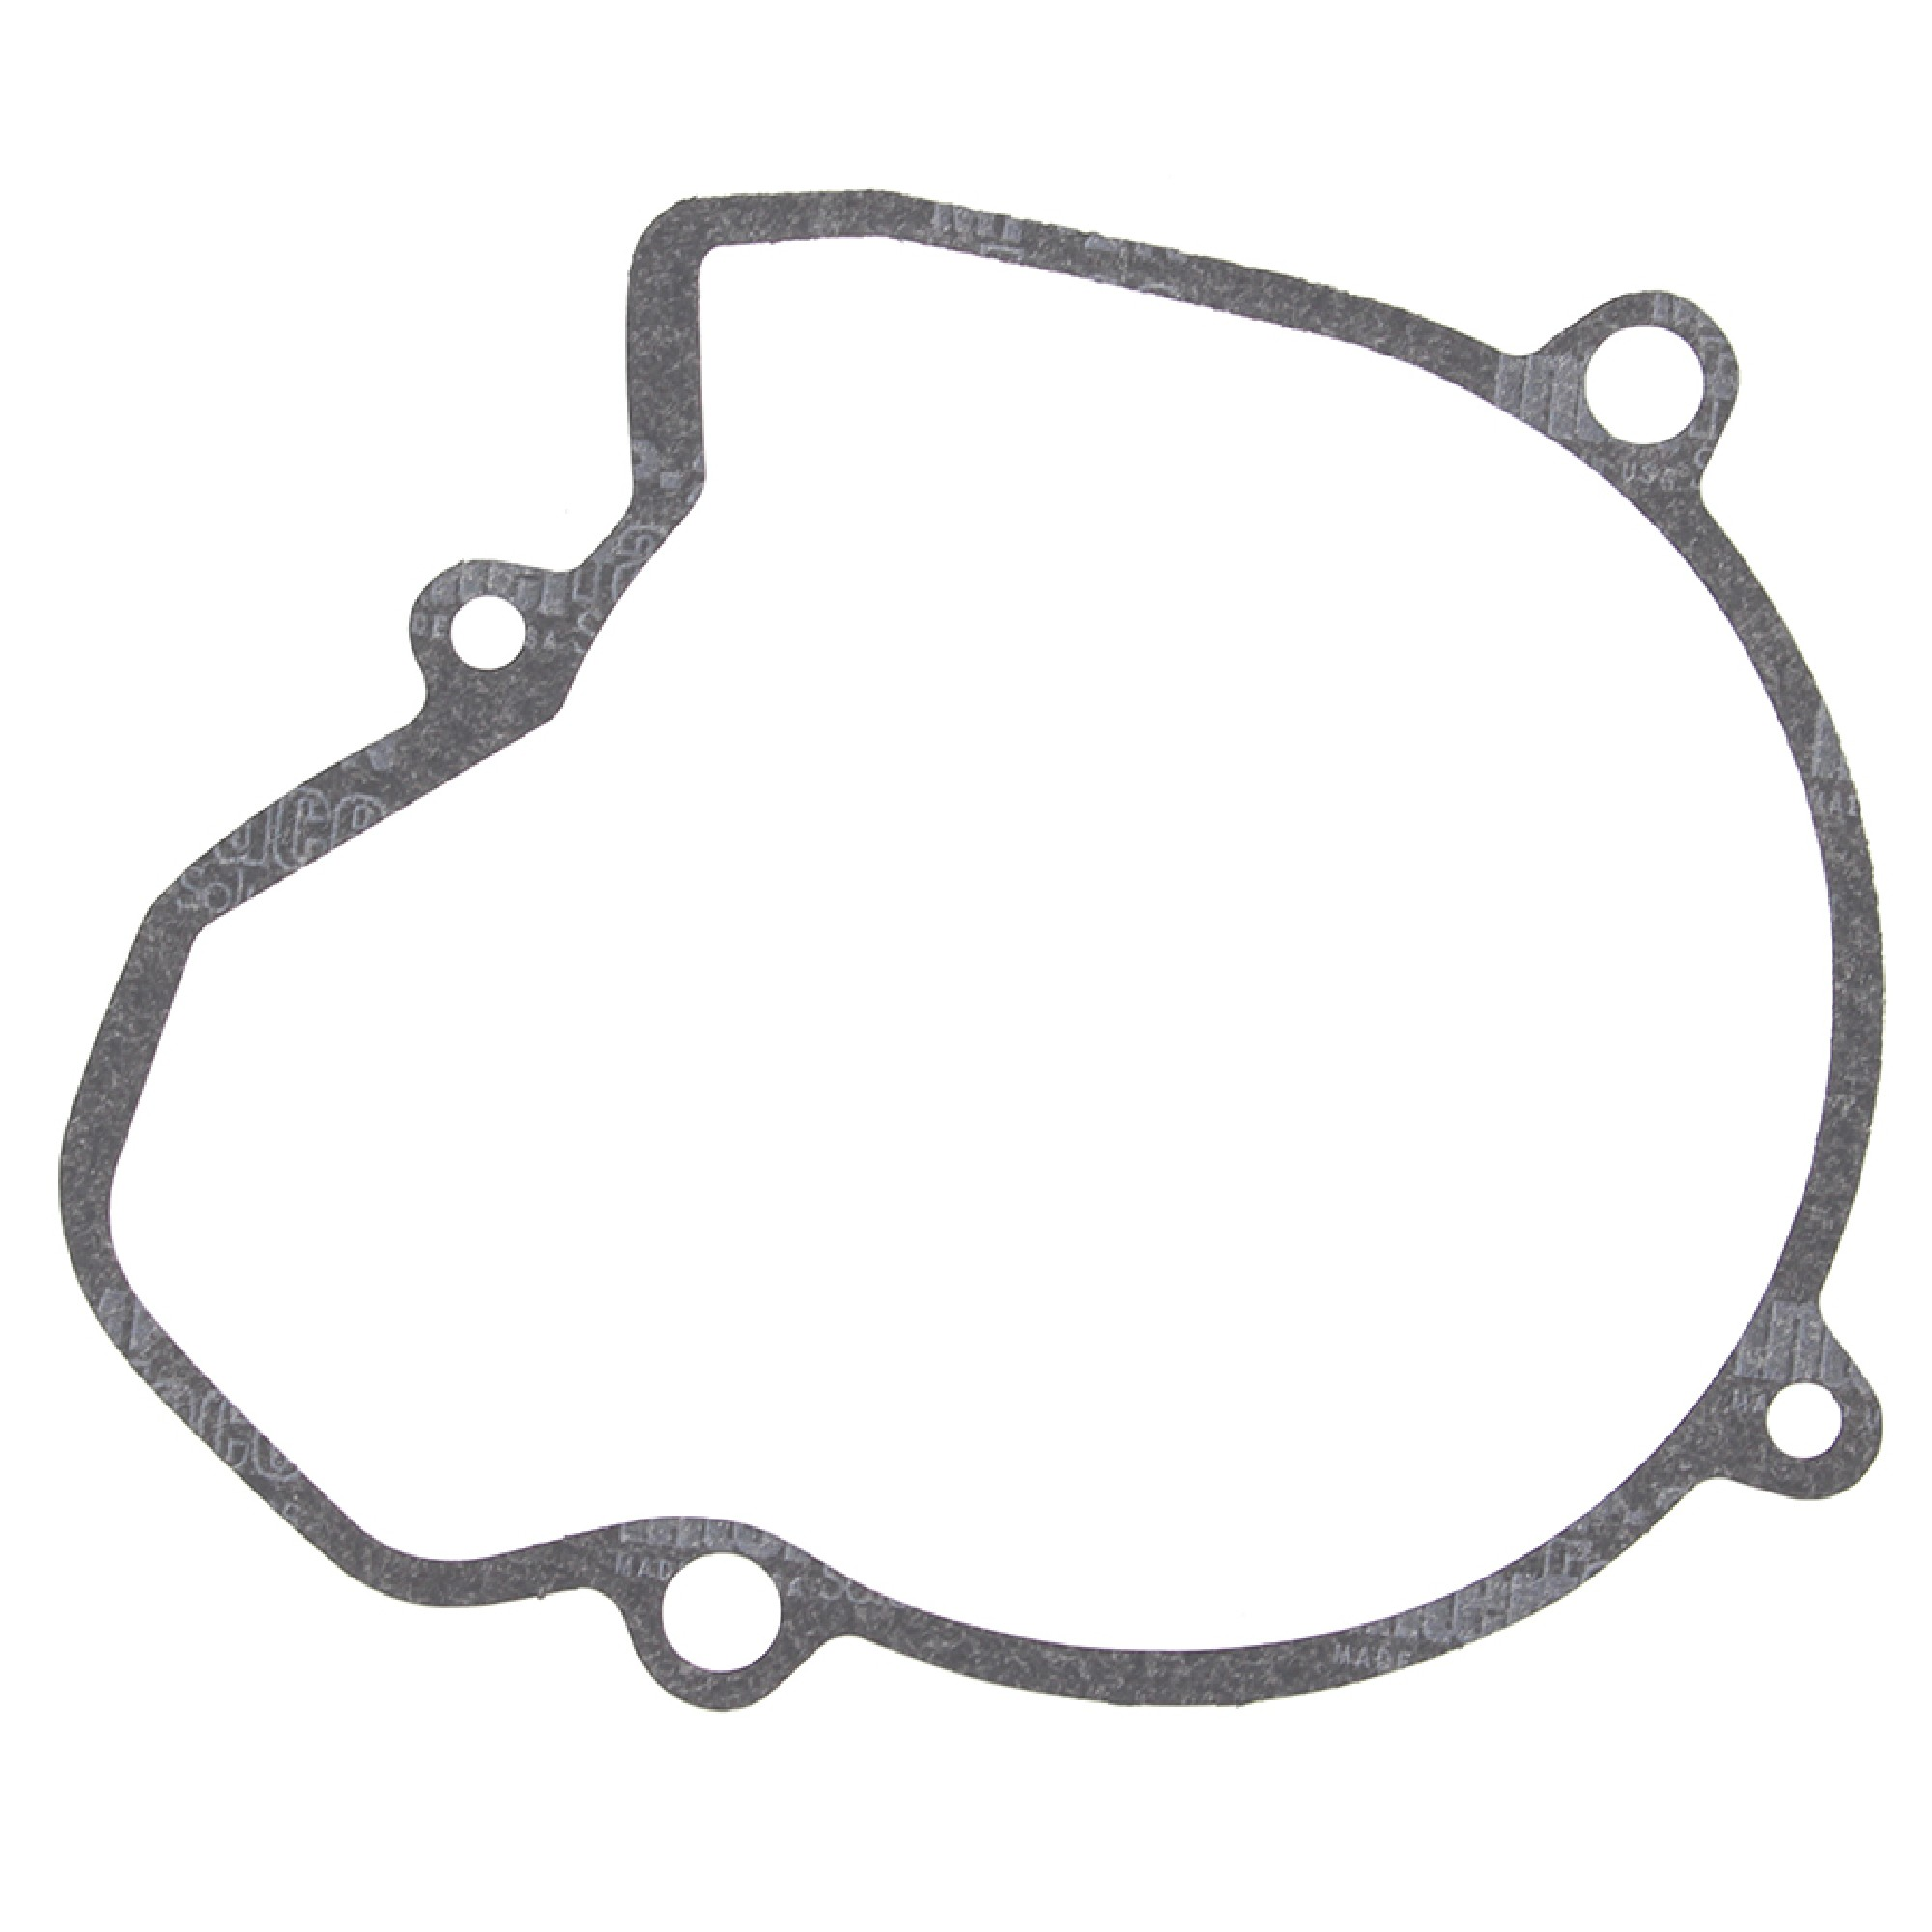 Winderosa 816144 KTM 520 EXC 2000-2002 Ignition Cover Gasket